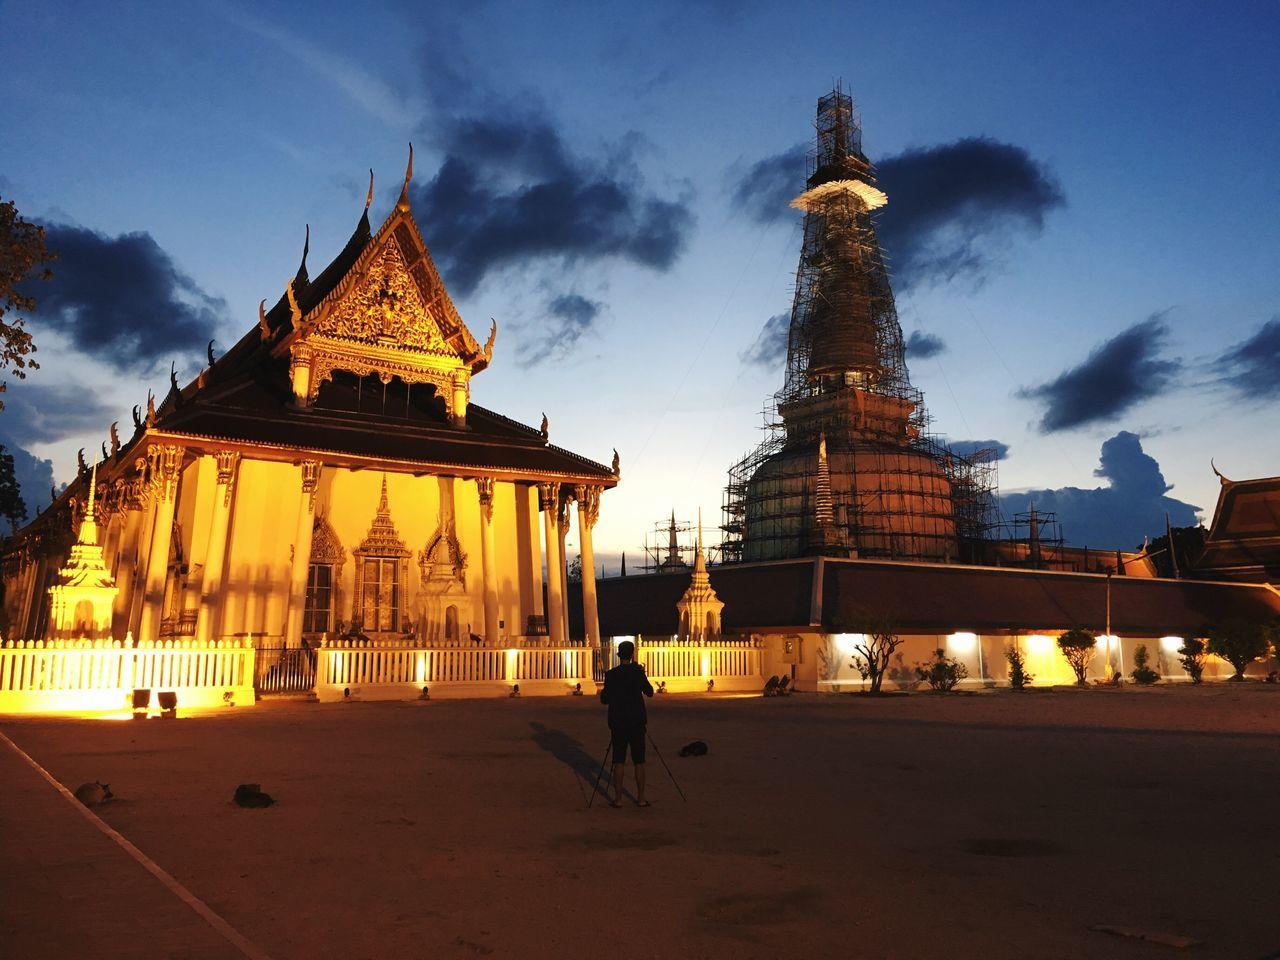 Temple Landmark Vacation Amazing Beautiful Buddhist Temple Buddha Nakhon Si Thammarat Sunset Golden Hour Gold